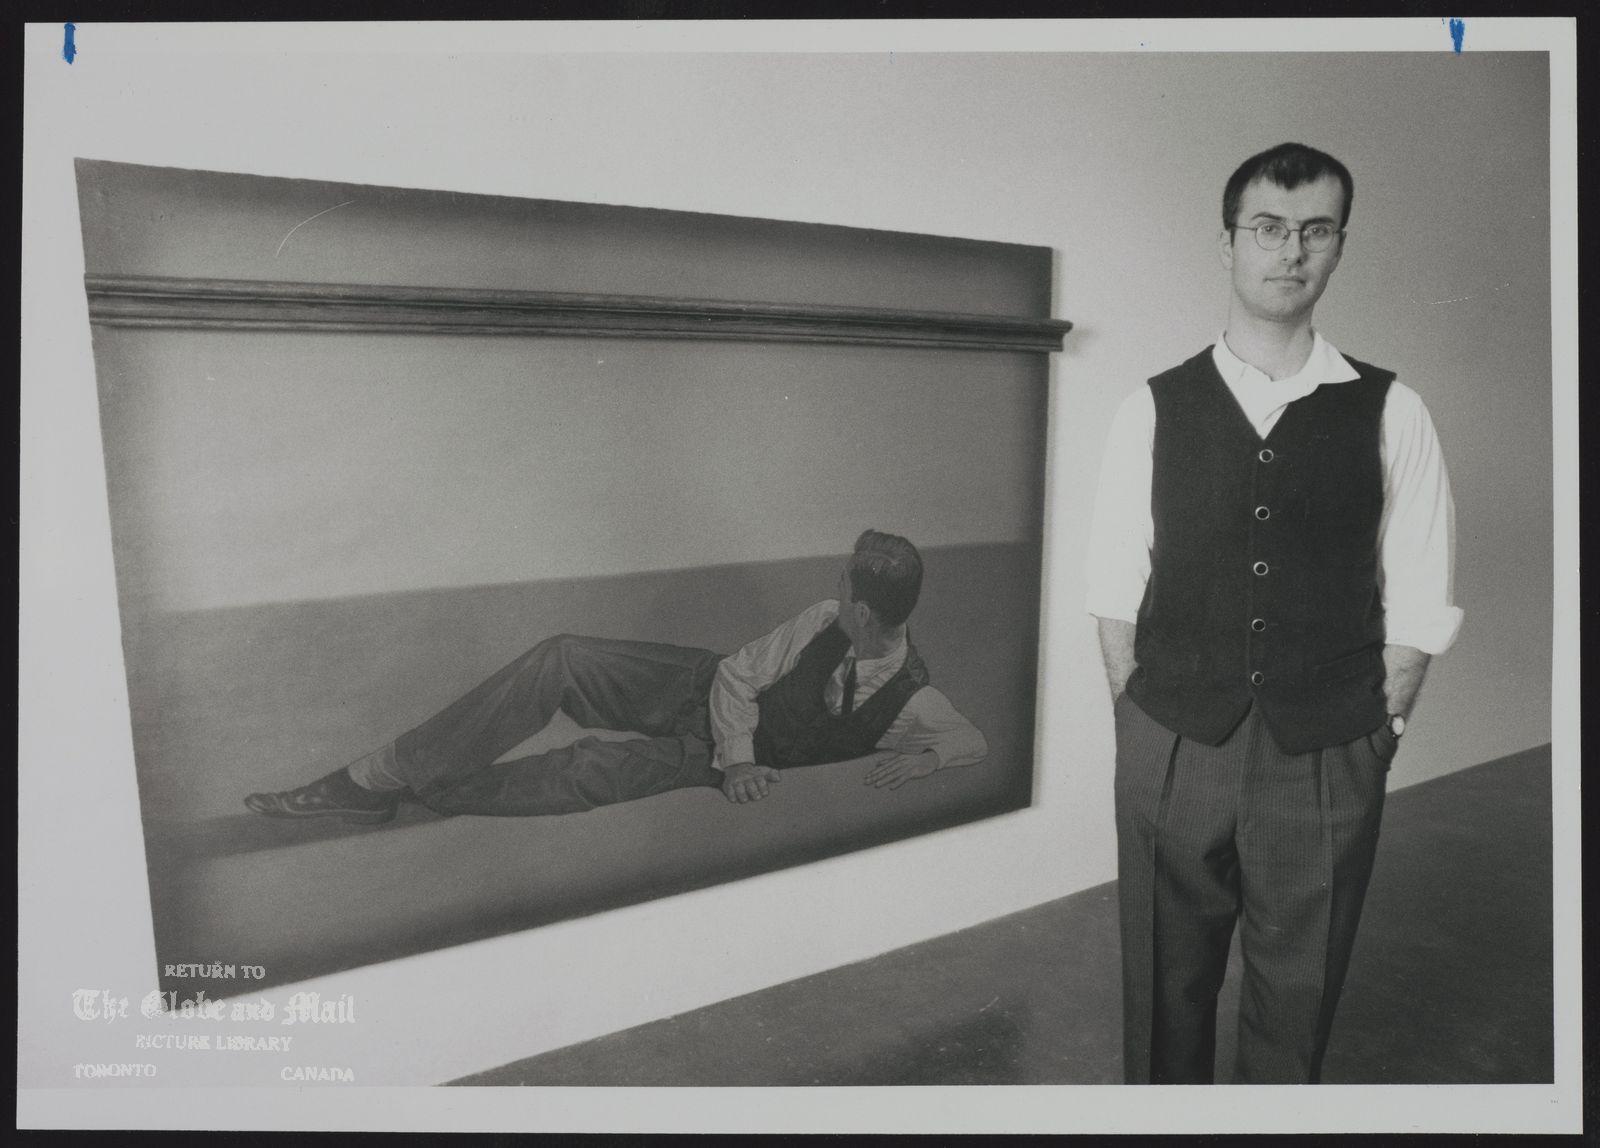 PIERRE DORION MONTREAL. ARTIST.